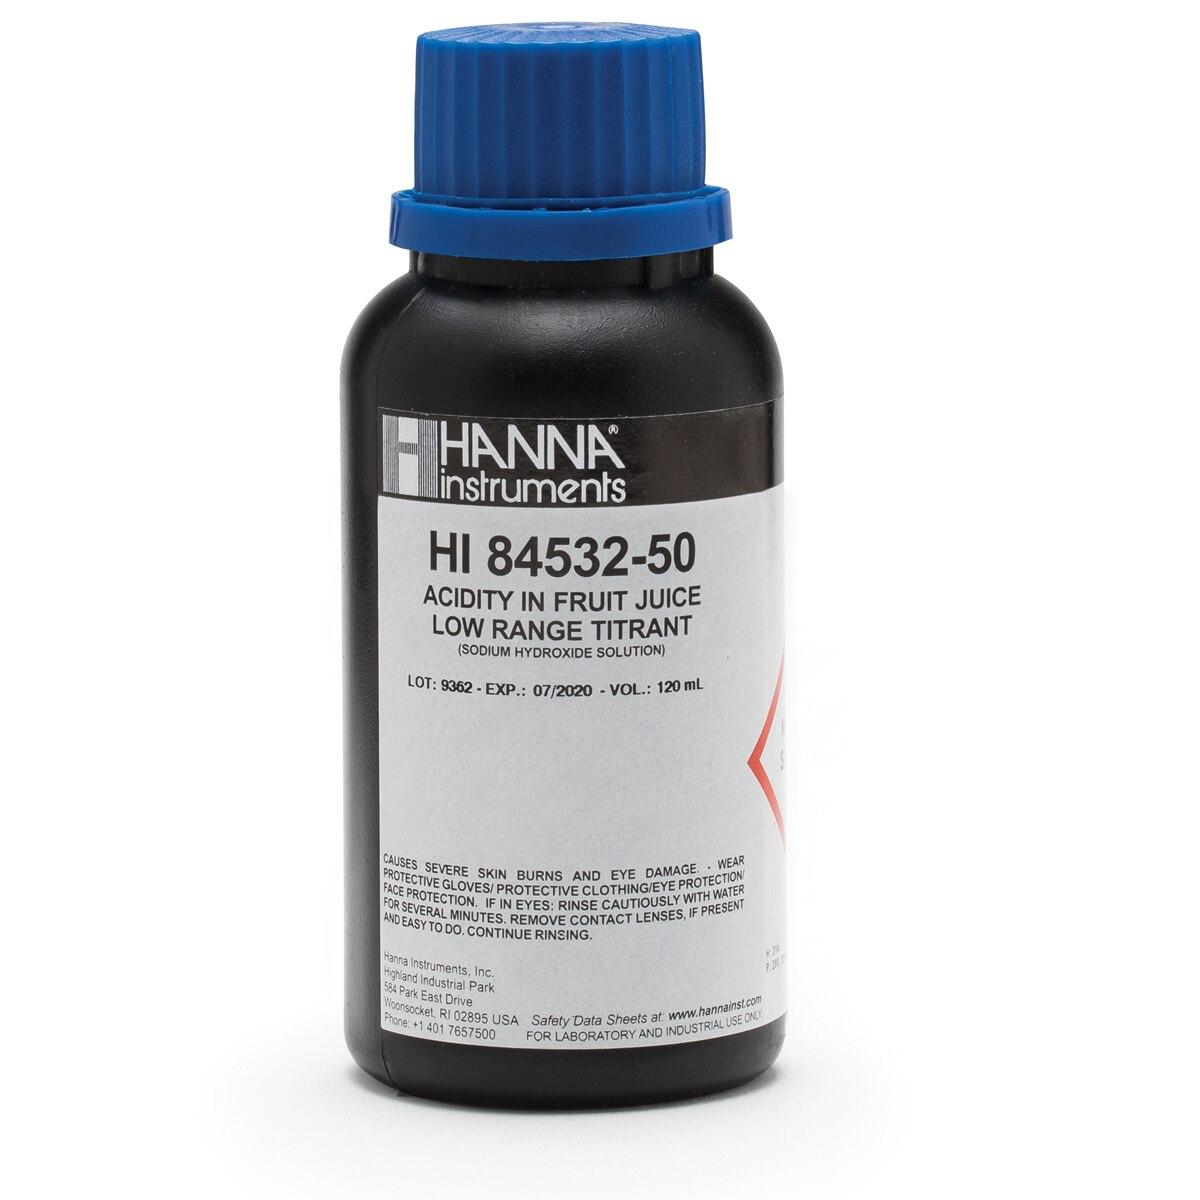 HI84532-50 Total Acidity in Fruit Juice Low Range Titrant (120 mL)